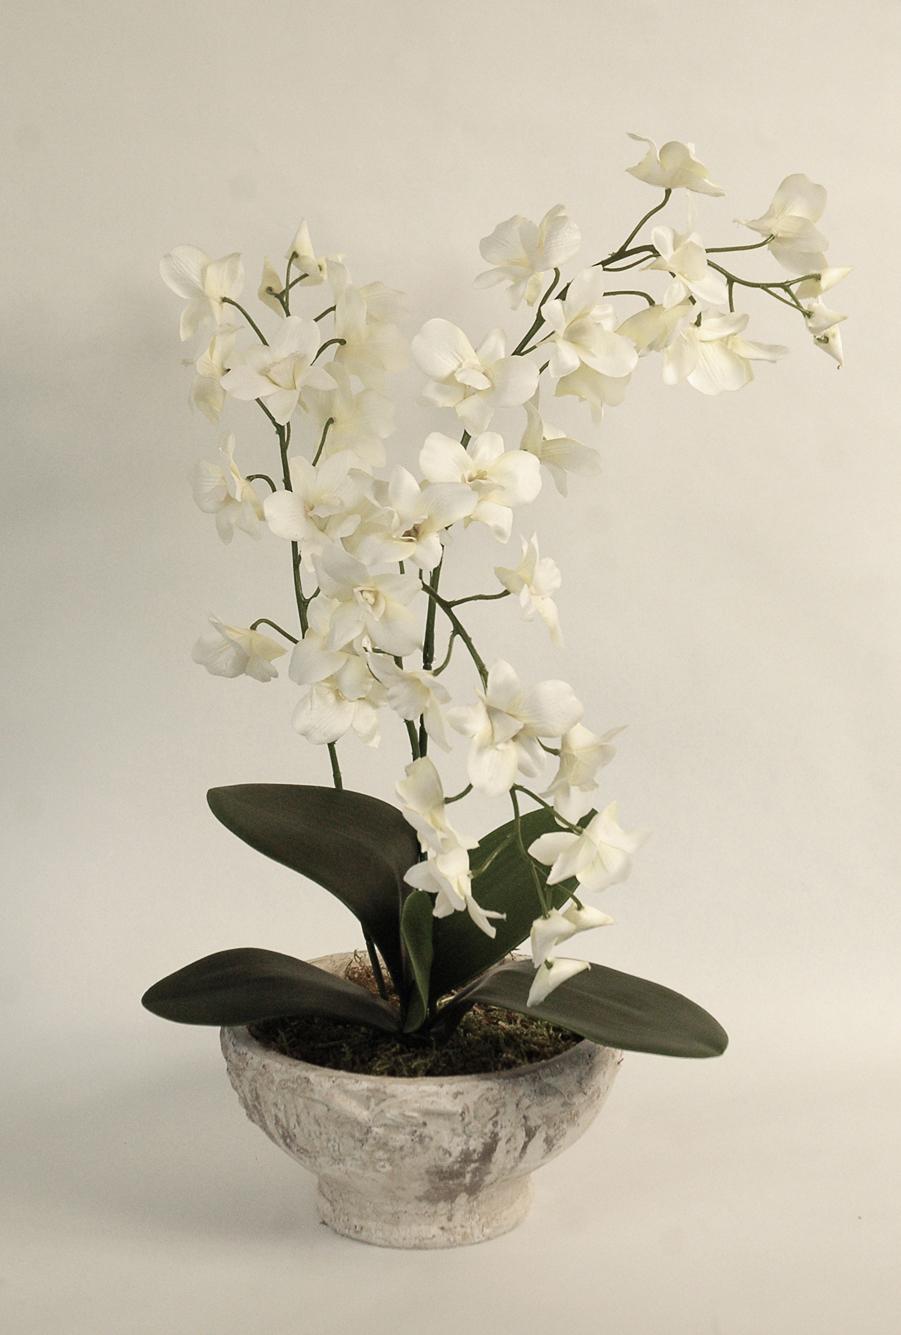 Lucy Silk Flowers Artificial Arrangements Pene Dene Flowers